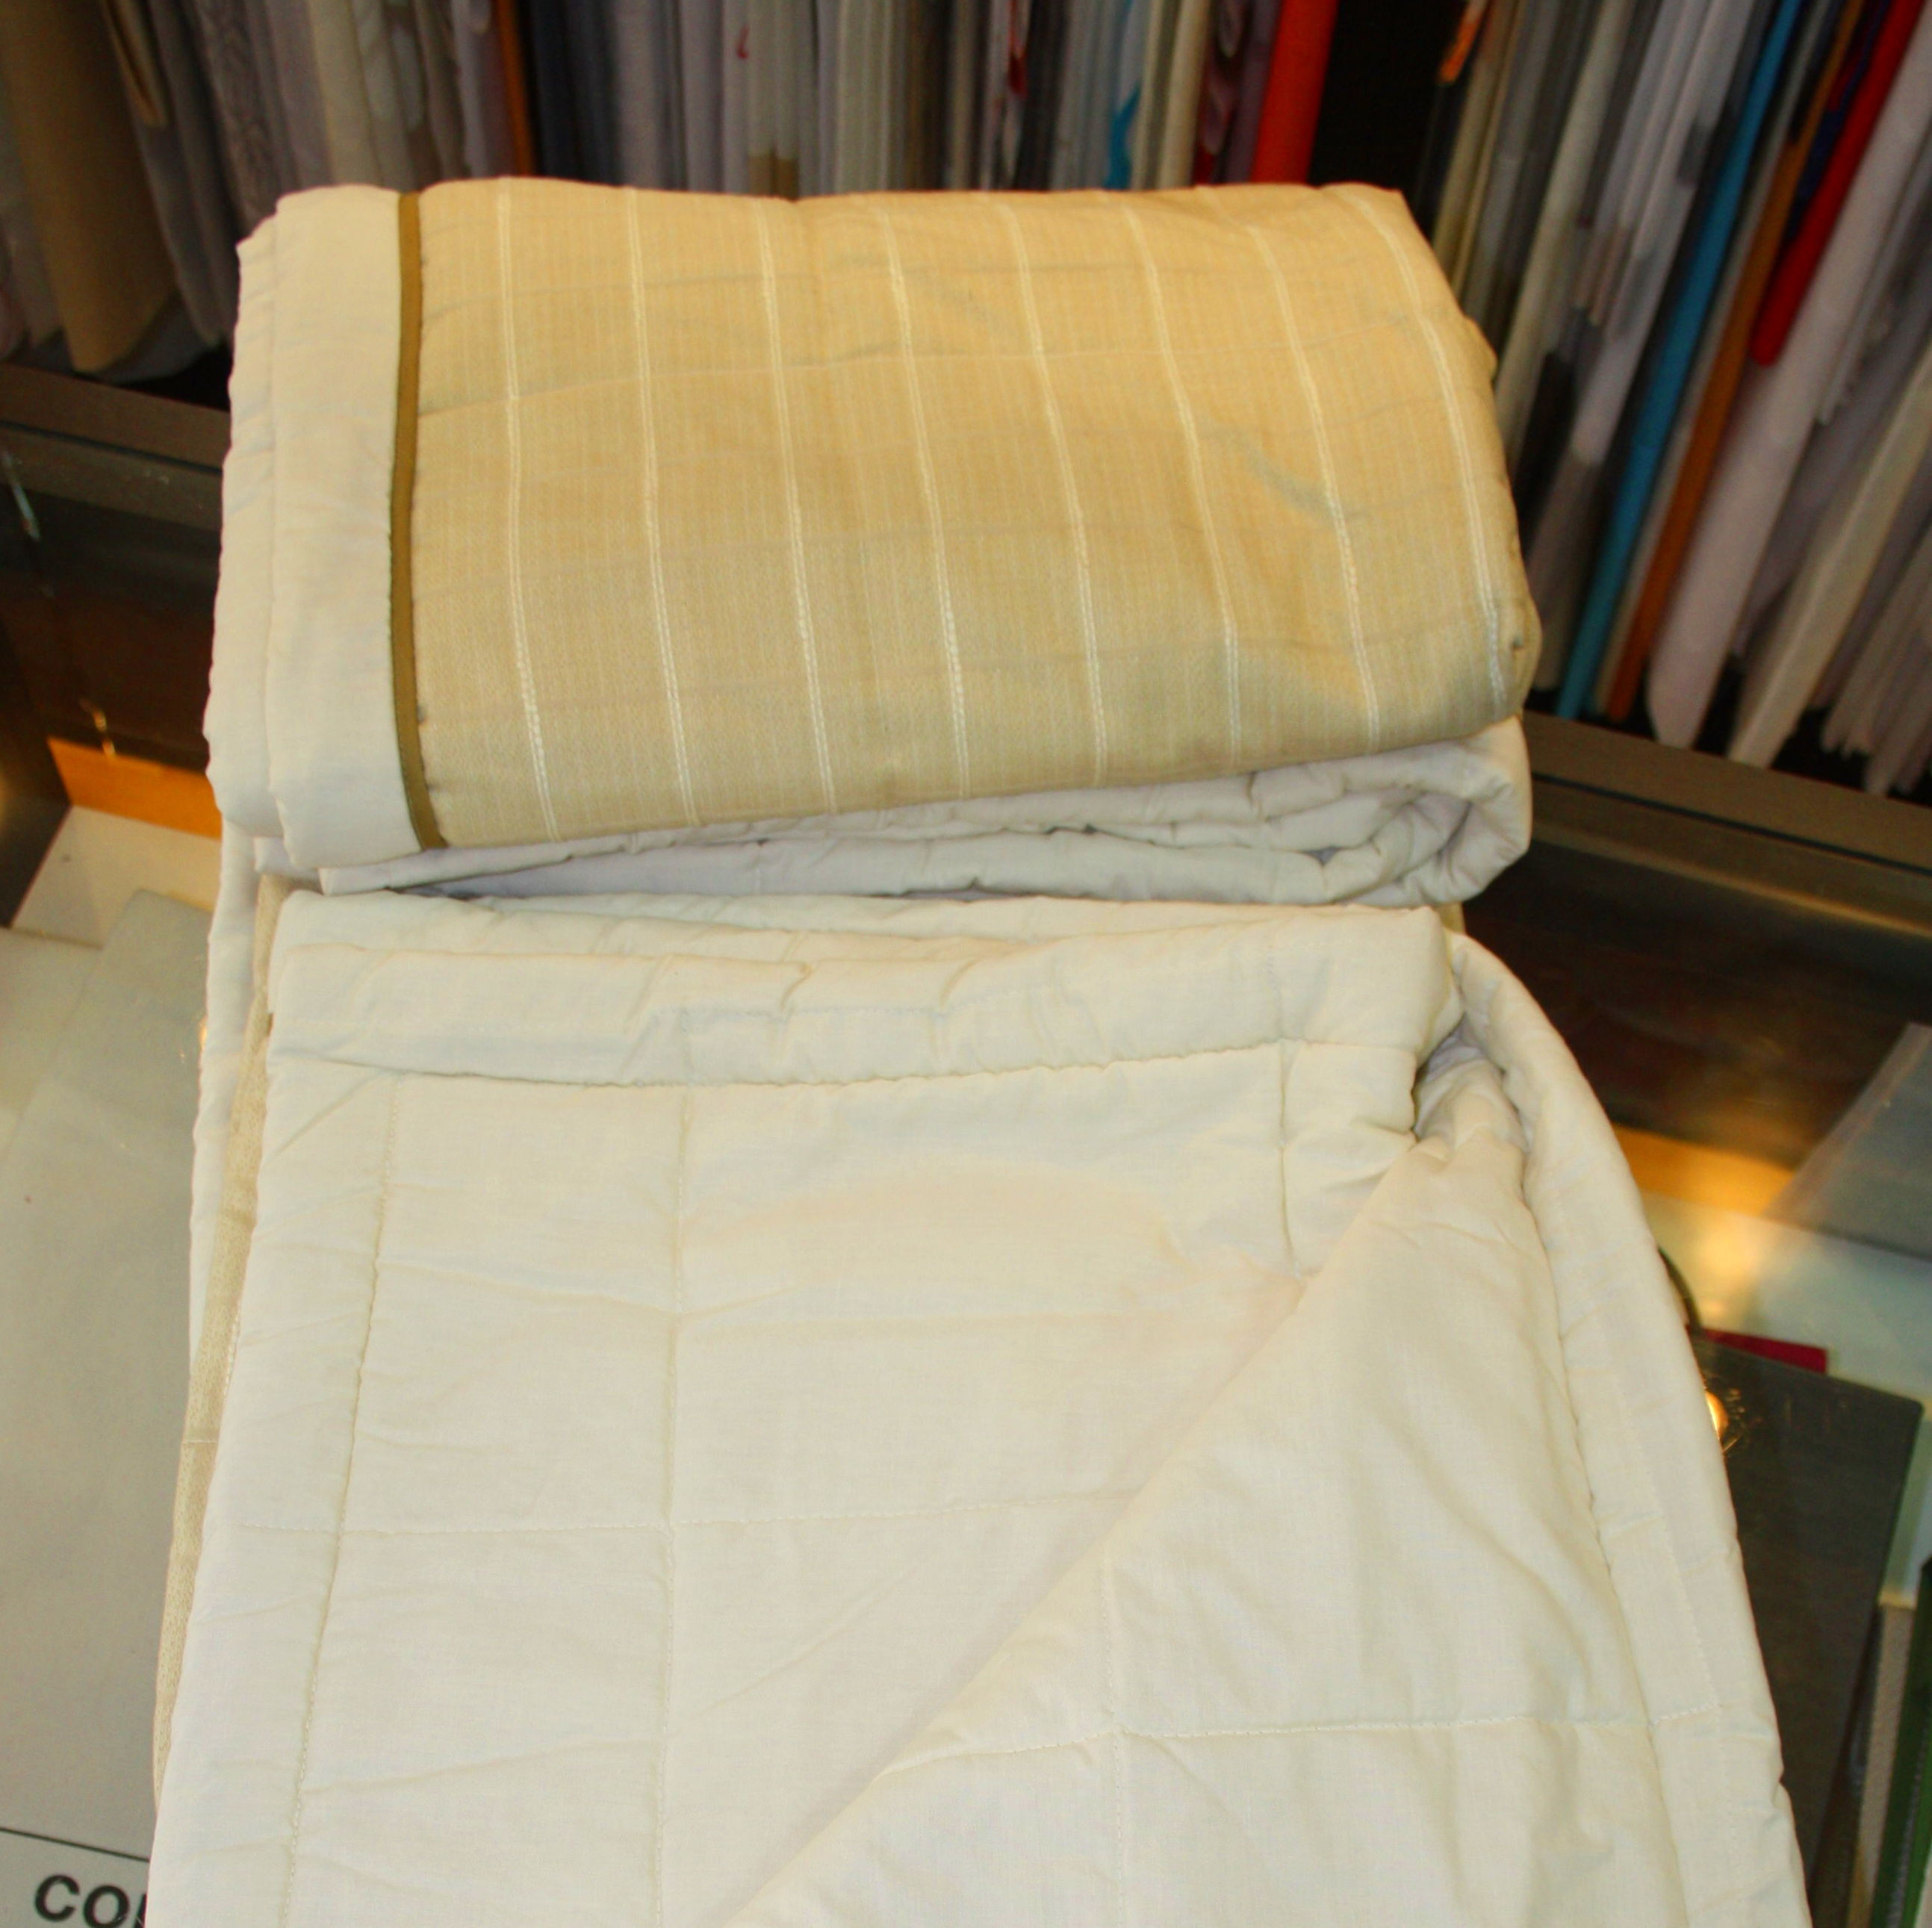 Colcha beige bouti cama 90 cm.: Catálogo de La Cibeles